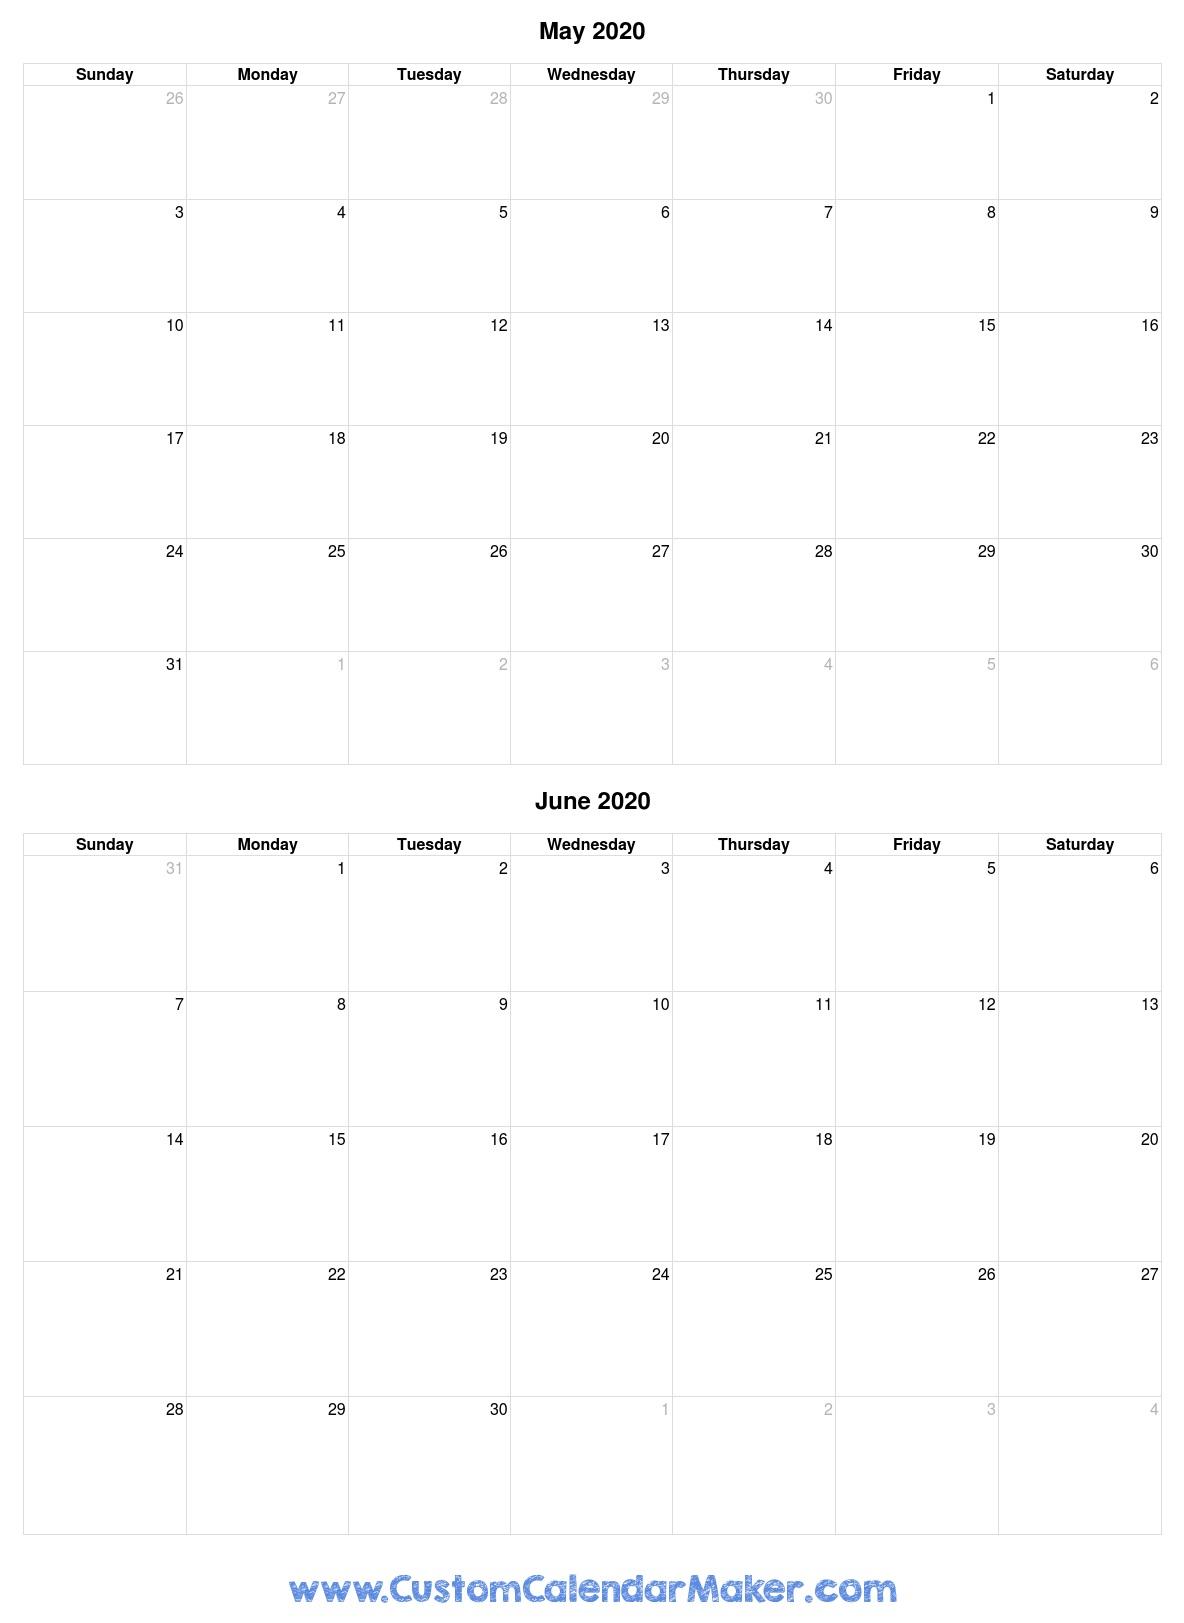 May And June 2020 Free Printable Calendar Template